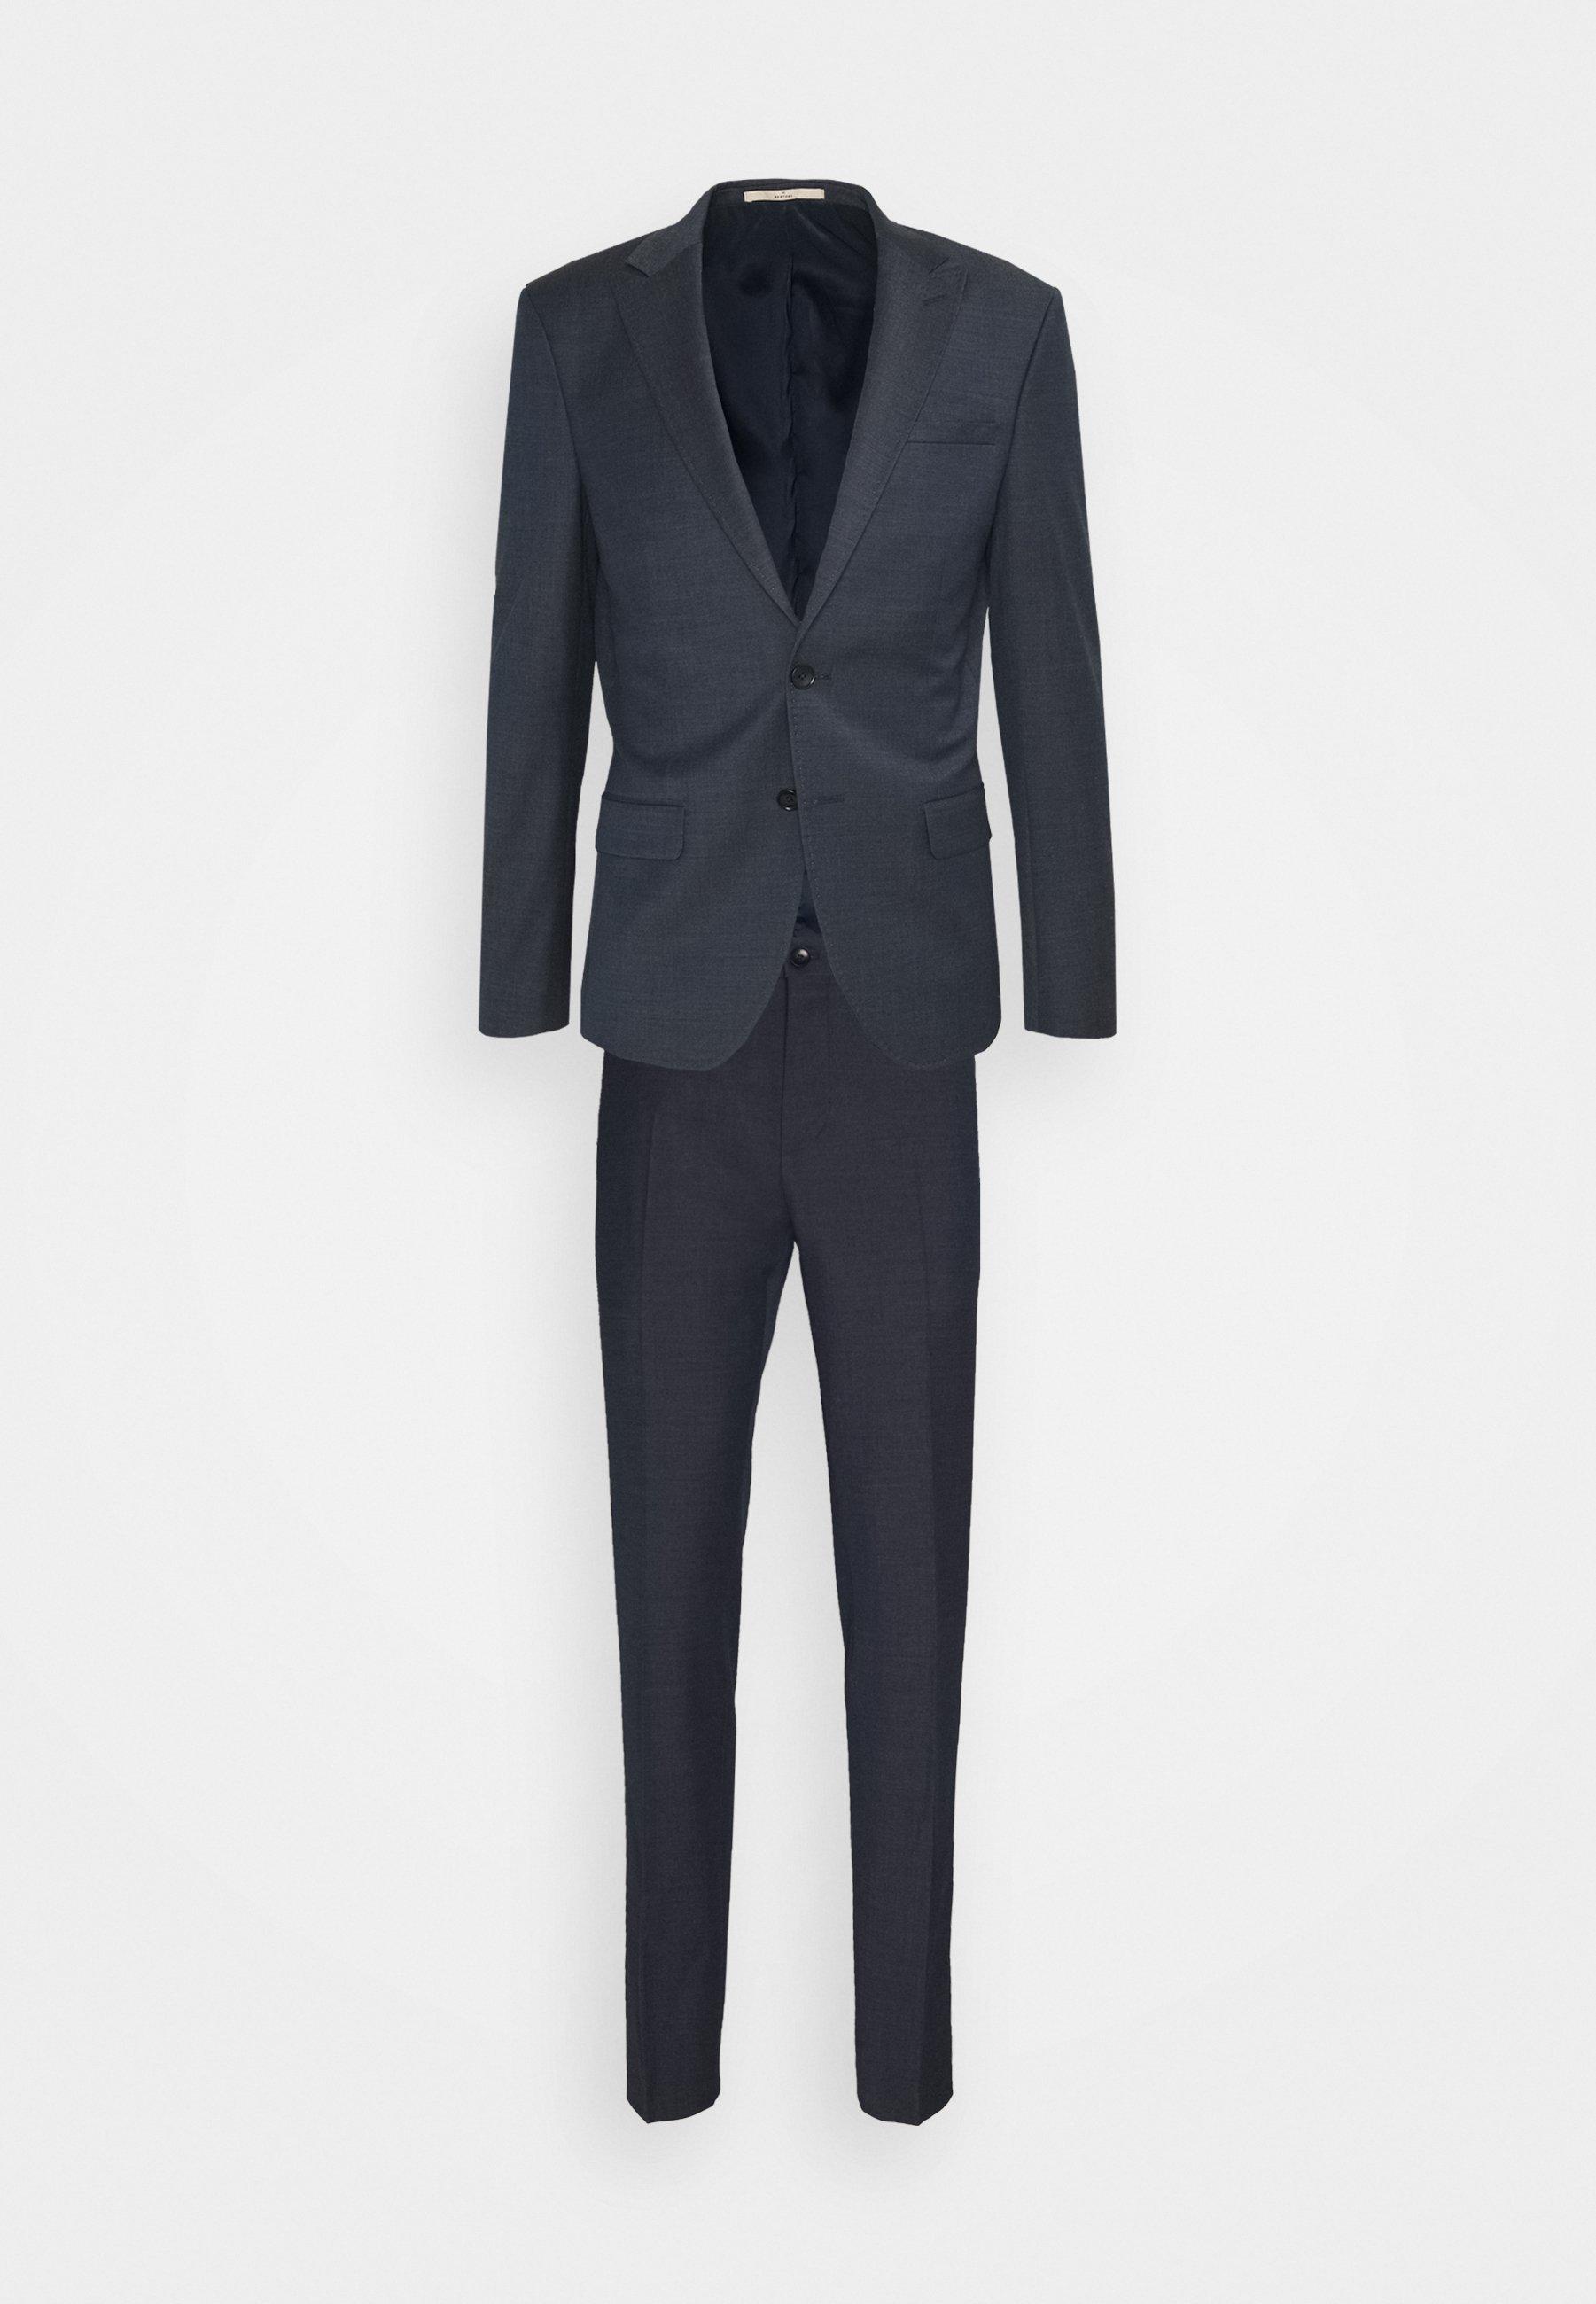 Men LUDVIGSEN-RAVN - Suit